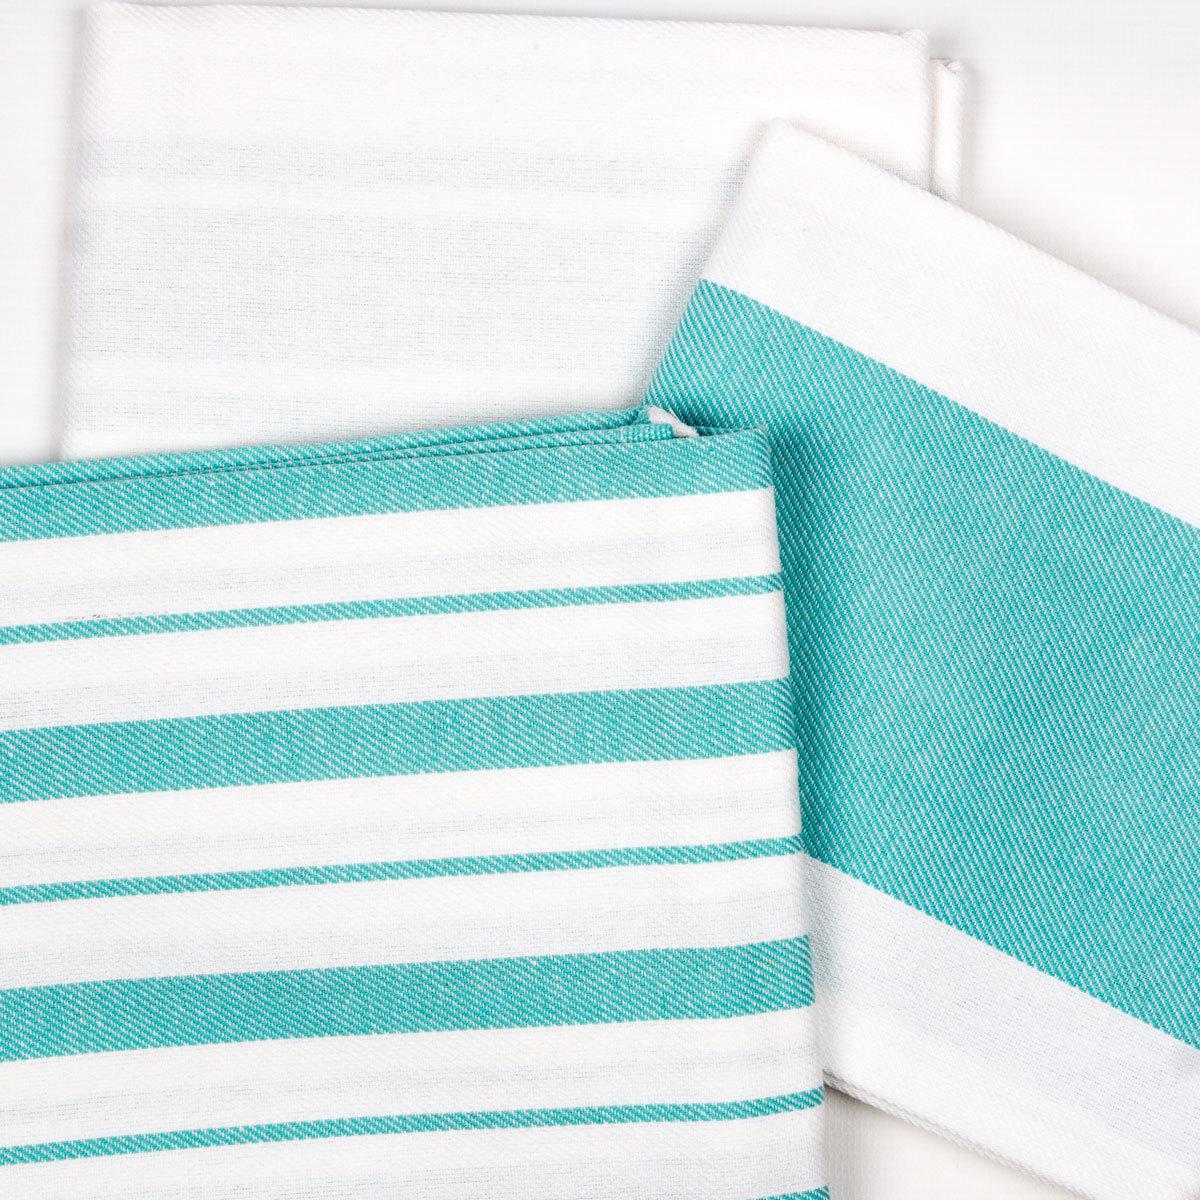 Купить Полотенца Arya, Кухонное полотенце Gabi Цвет: Синий (50х70 см), Турция, Белый, Желтый, Бязь